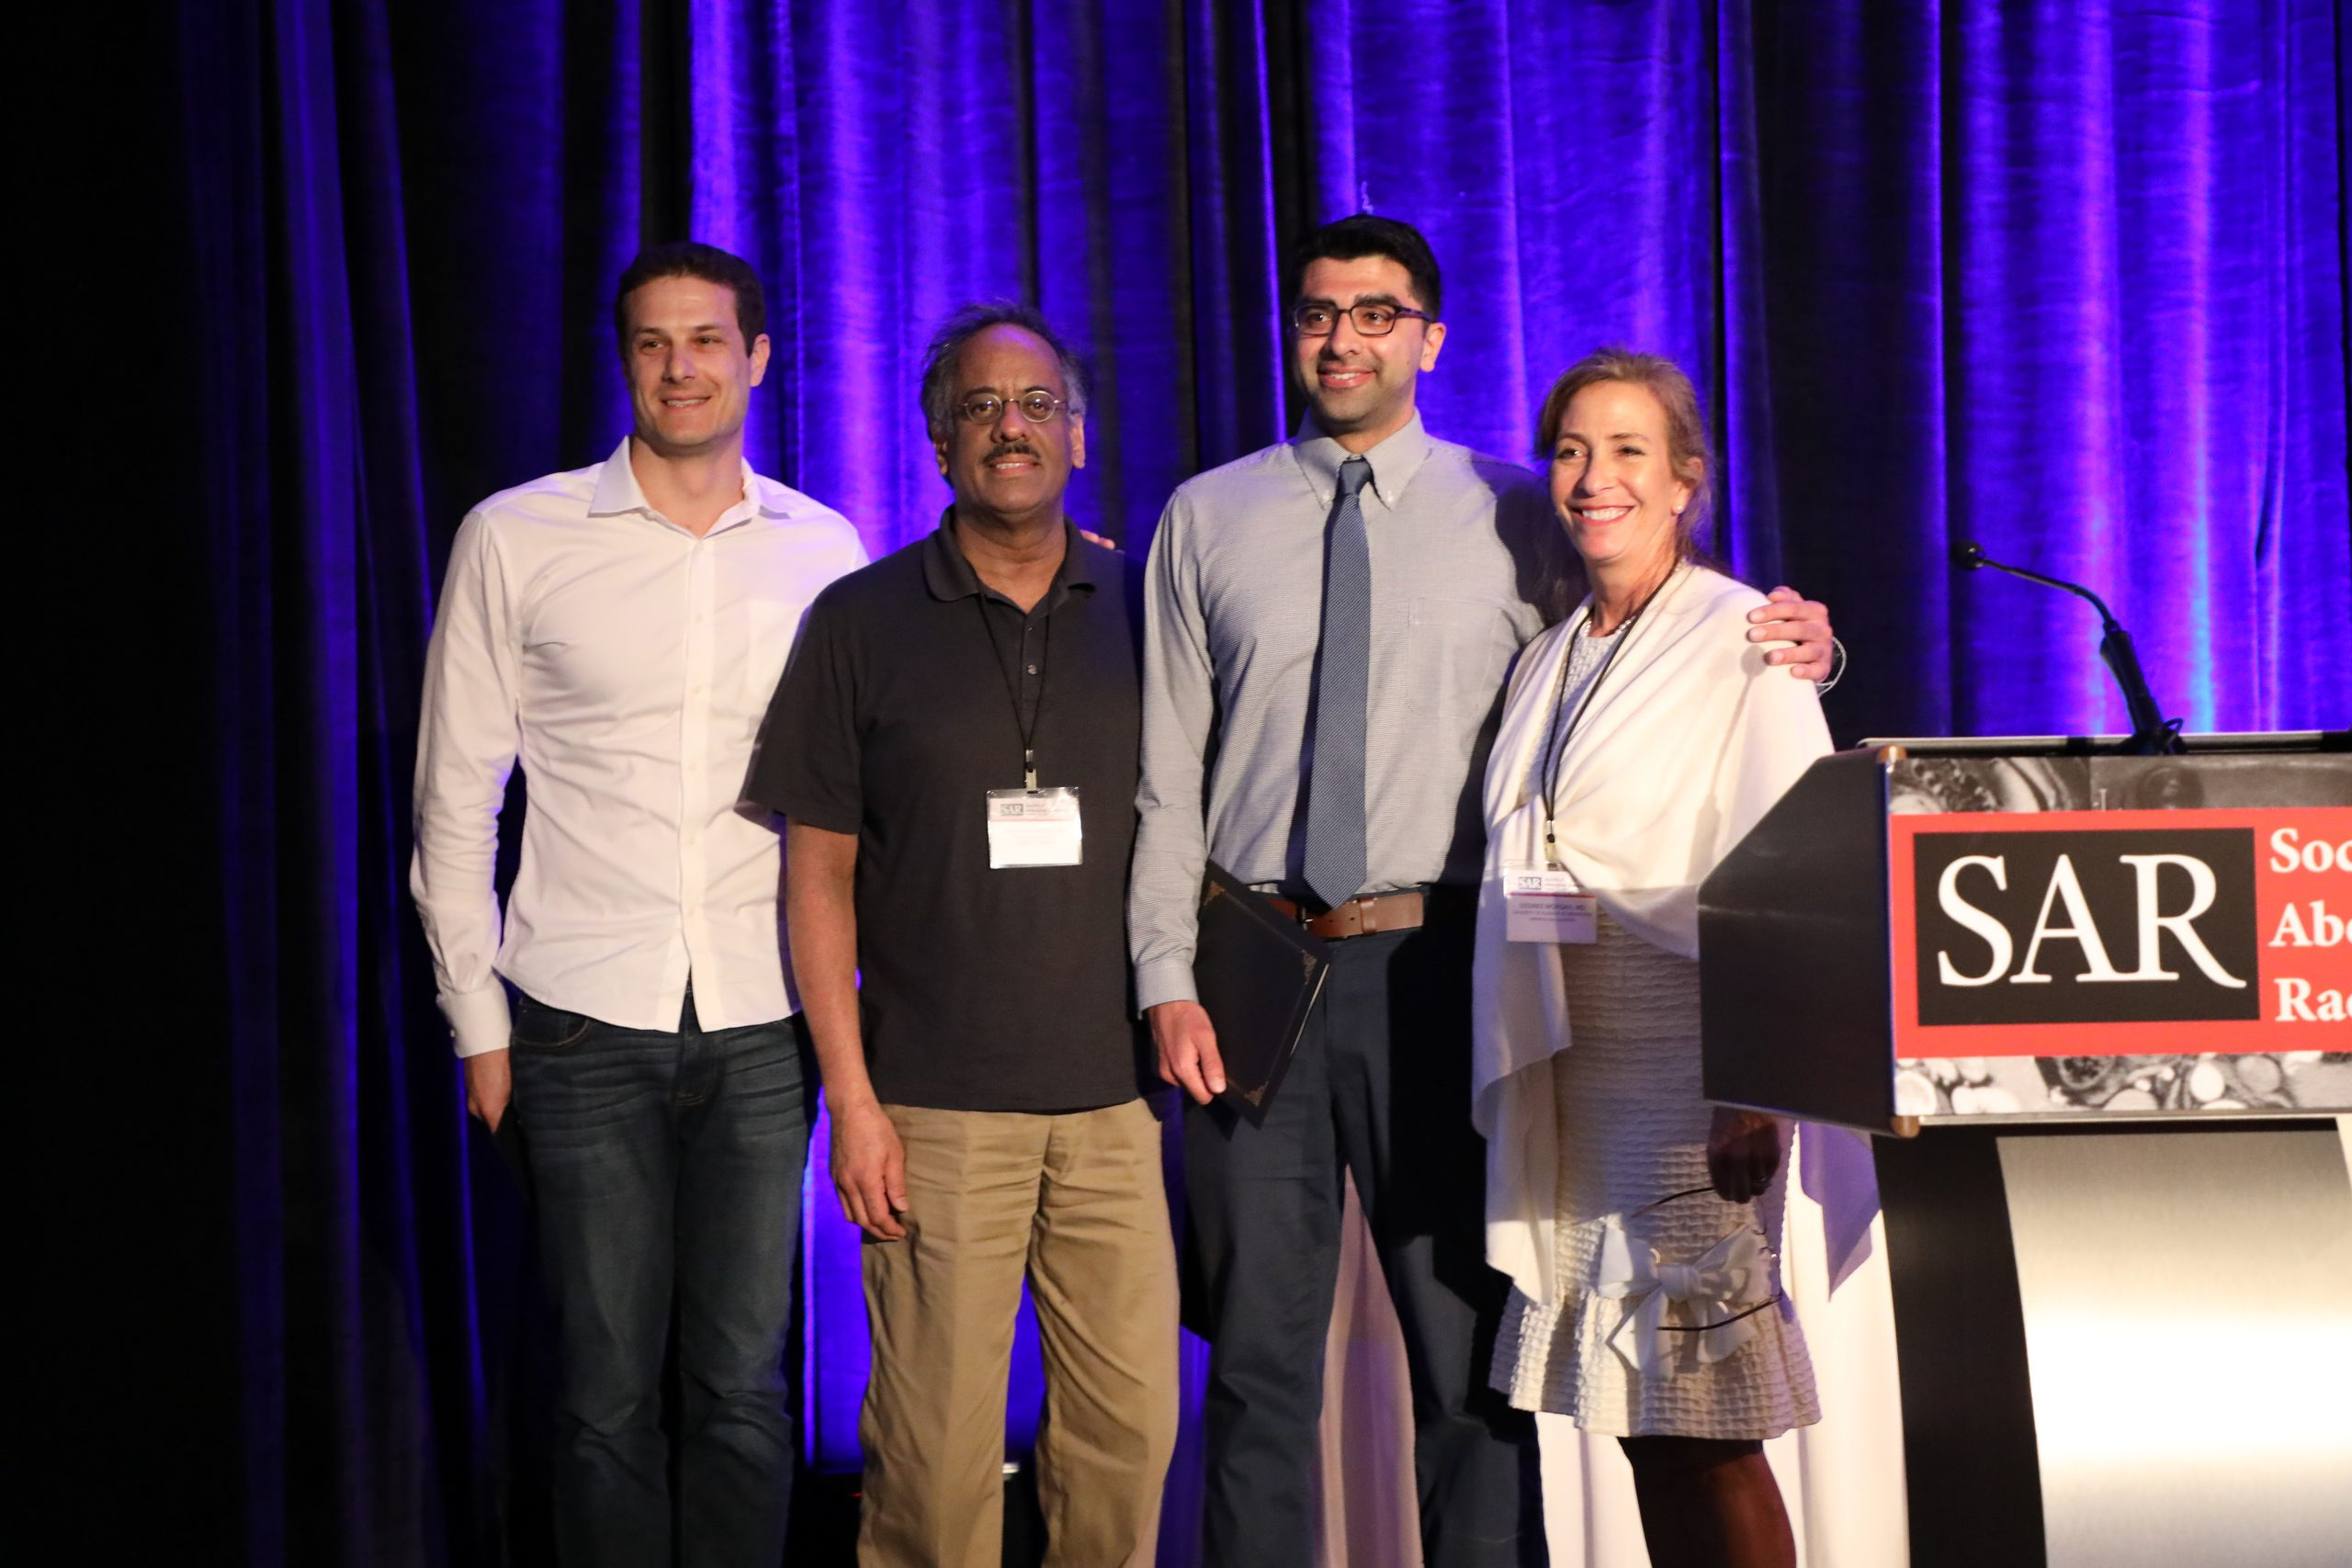 sar_tank_award_winners